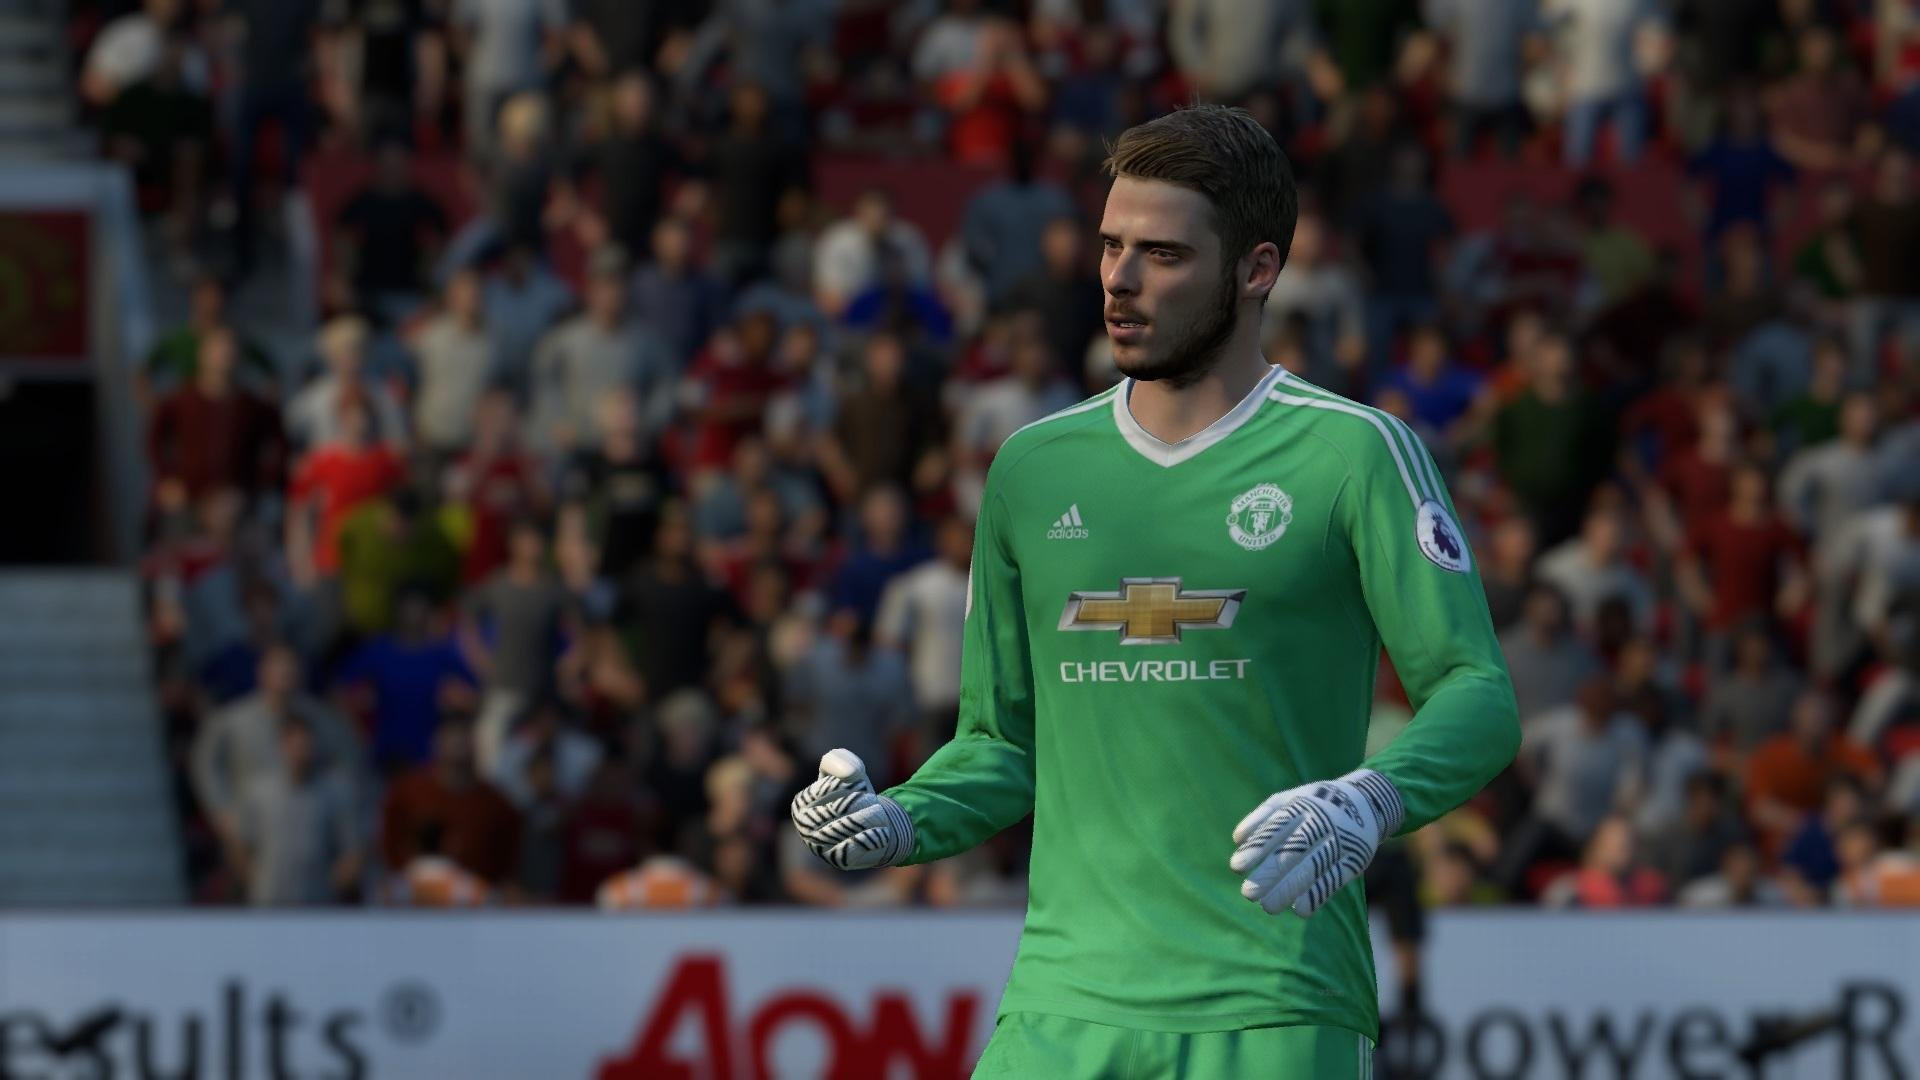 FIFA 19 FUT: Normale Keeper sind genauso stark wie Spezialkarten, laut Beta